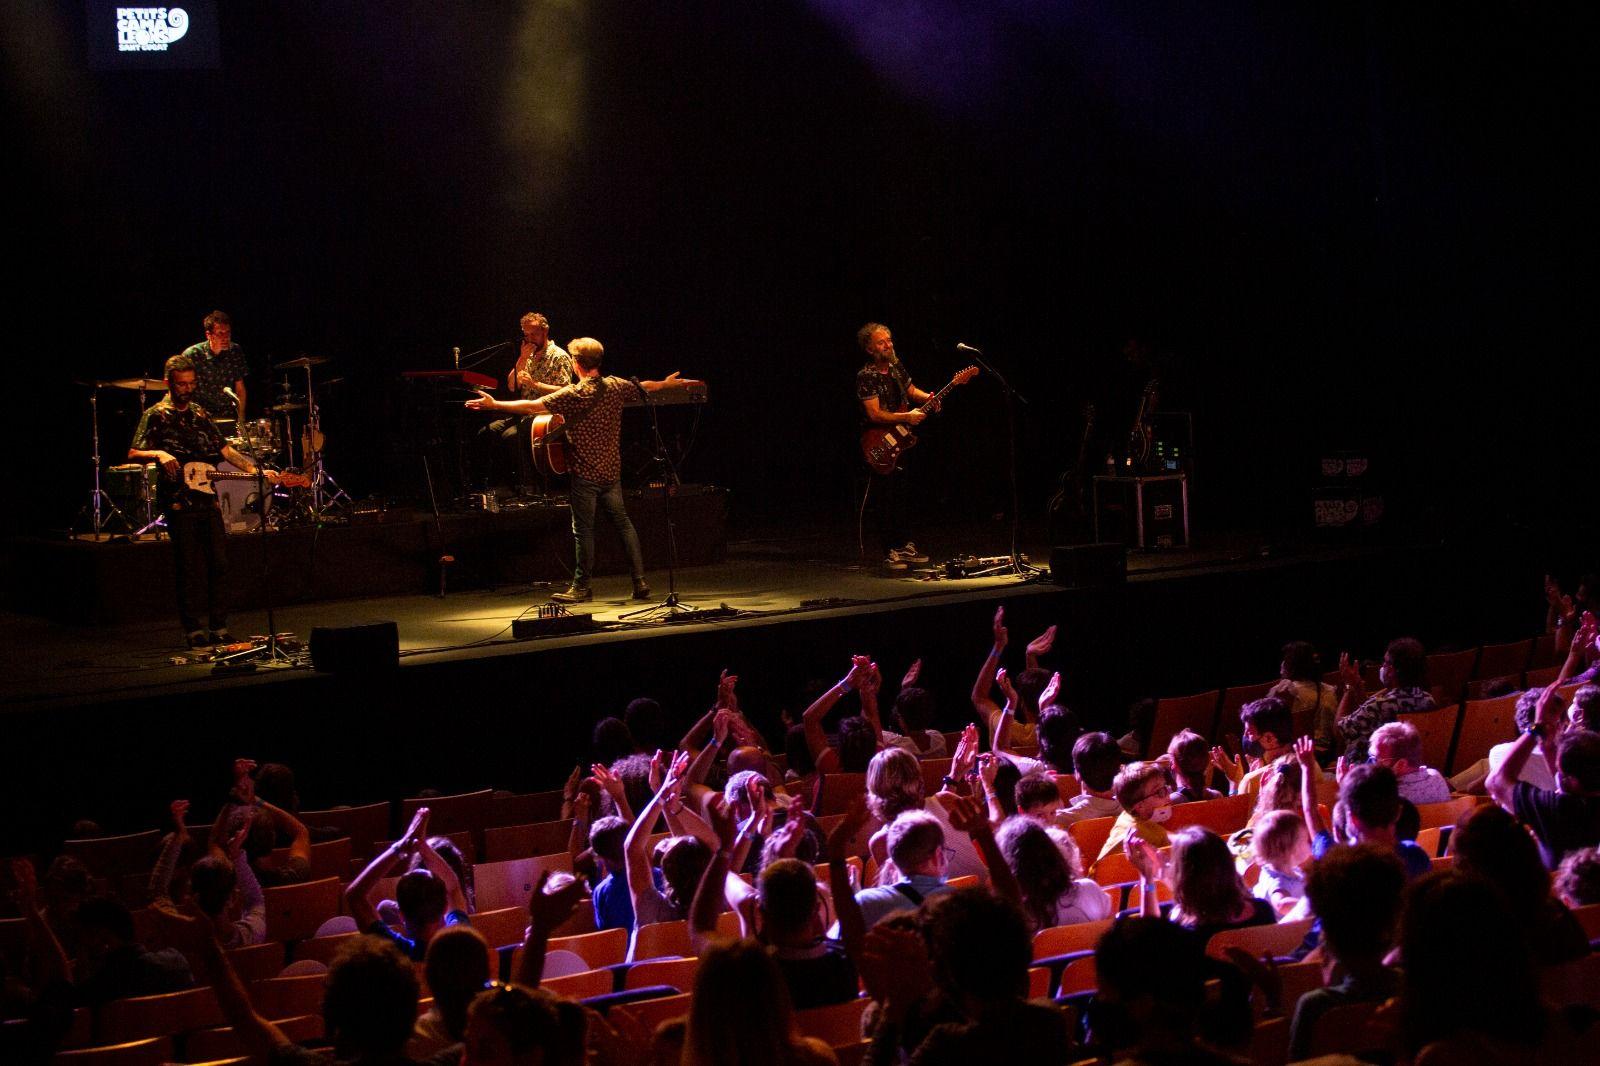 Mishima al festival Petits Camaleons. Foto: Raul Clemente